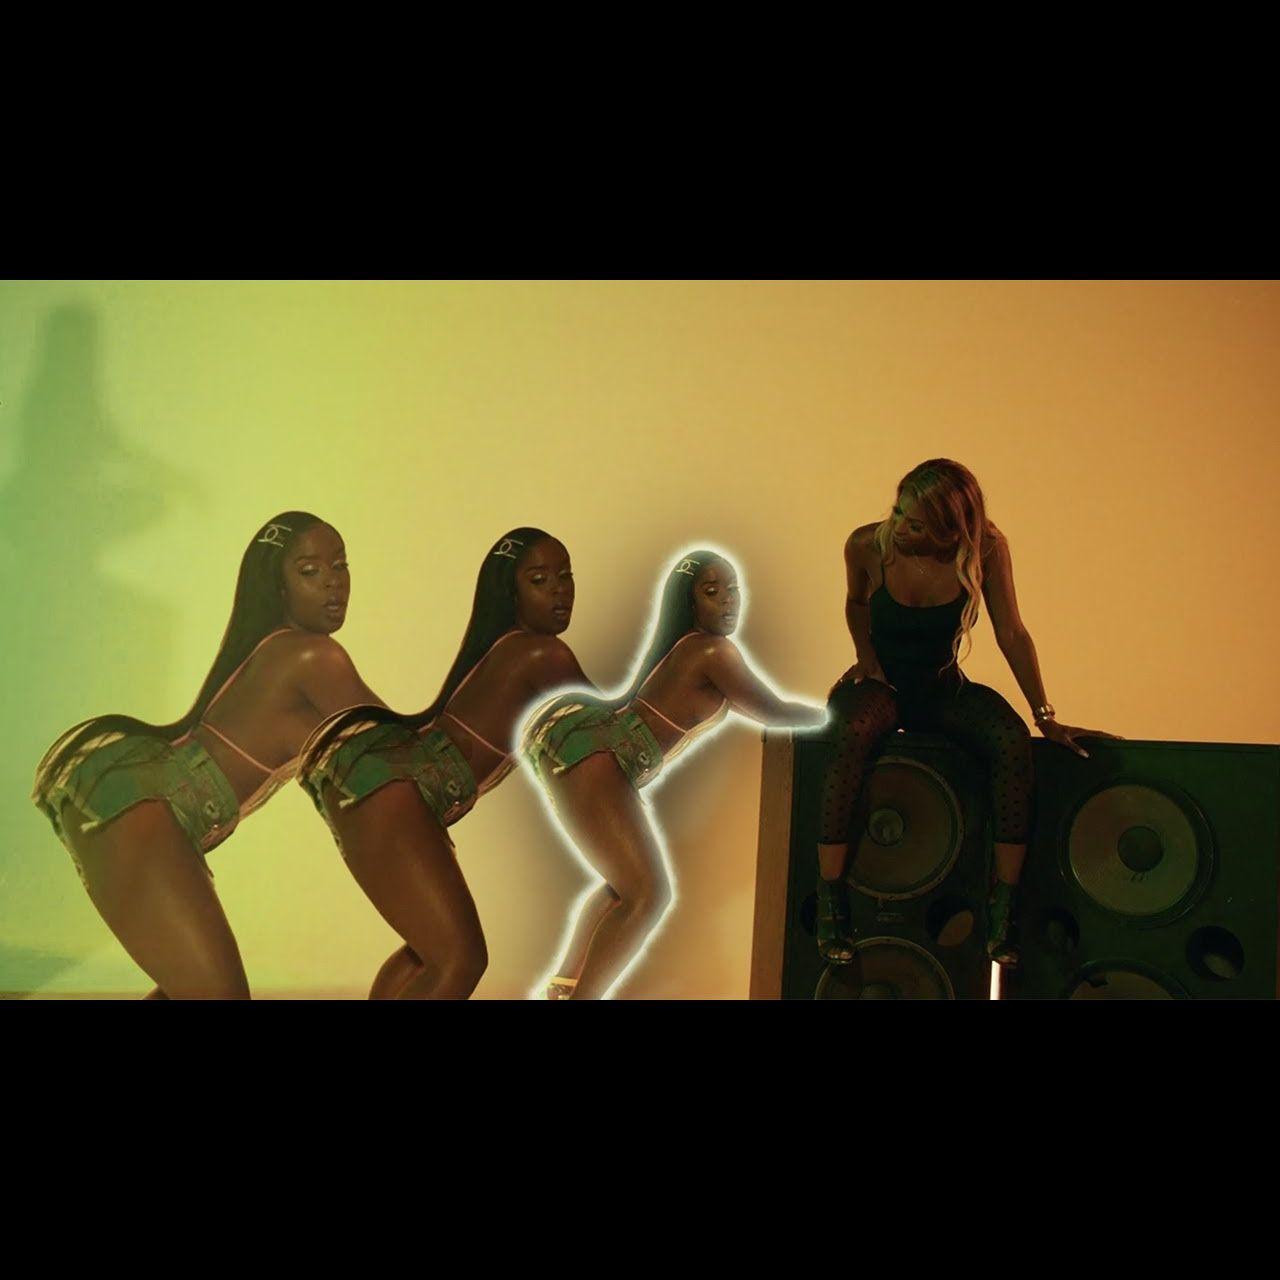 DJ Leska - Buddy (ft. Bamby, Jahyanaï and Chily) (Thumbnail)